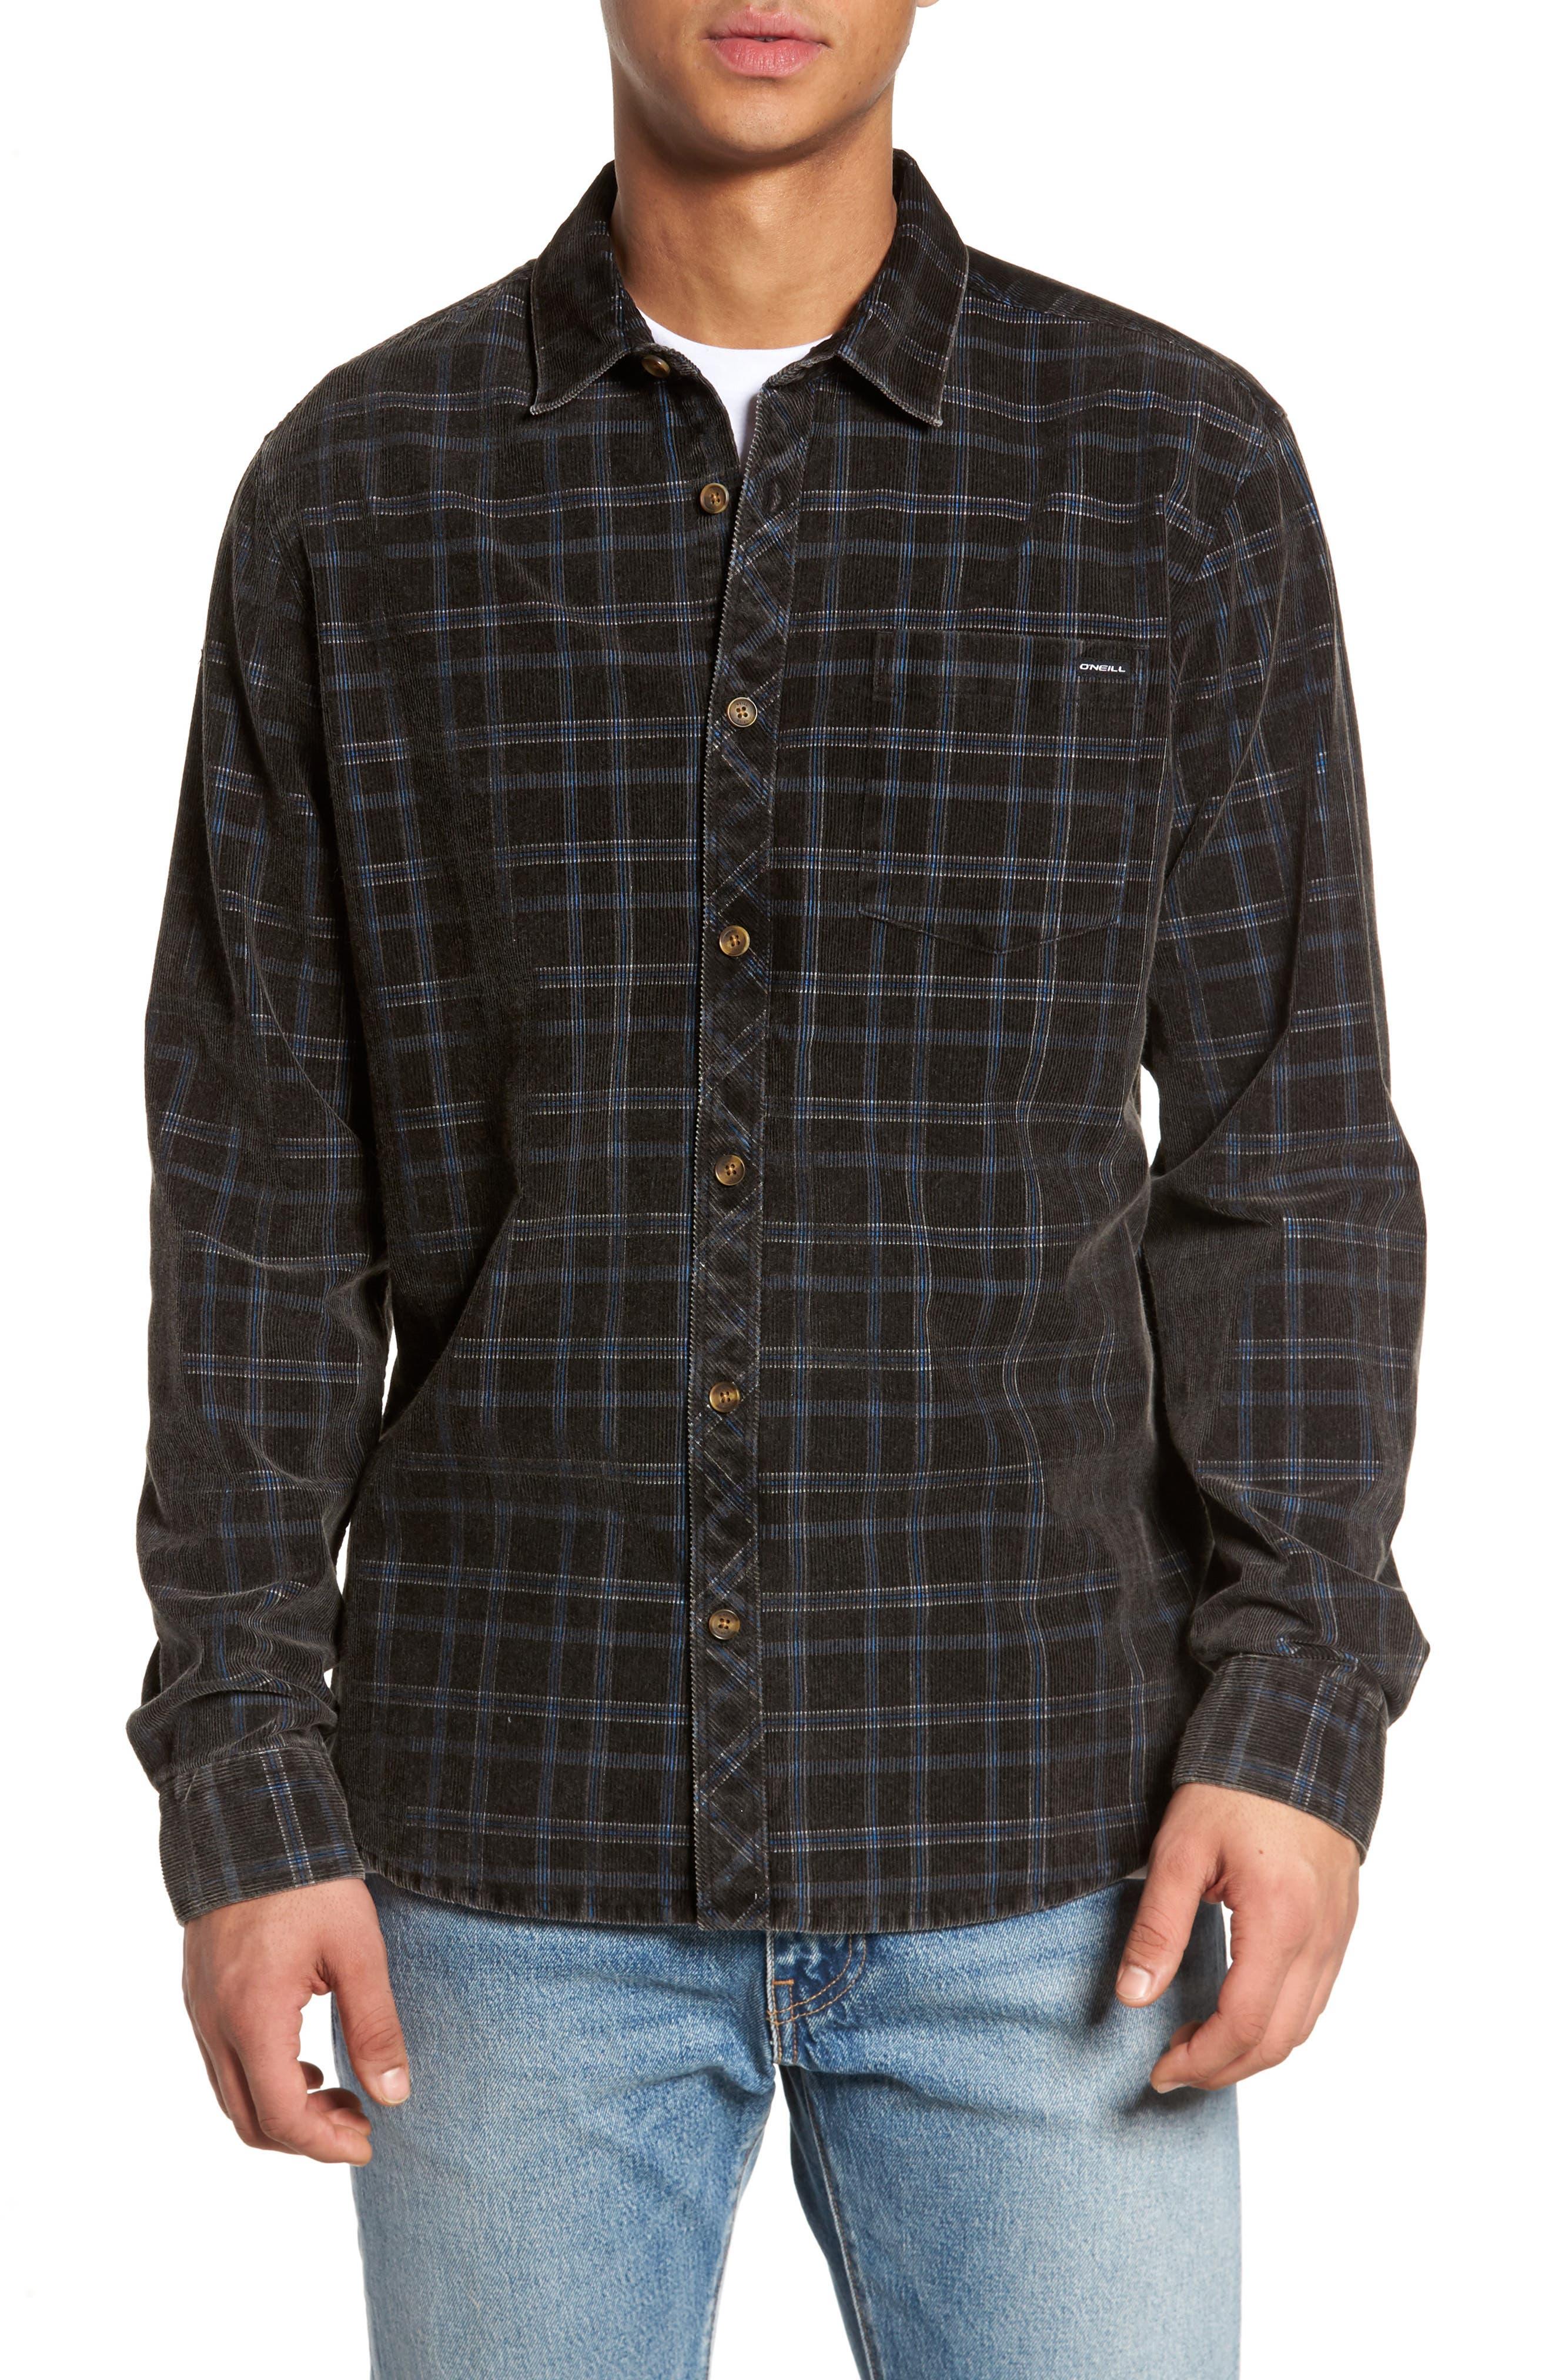 Bradley Corduroy Shirt,                             Main thumbnail 1, color,                             001